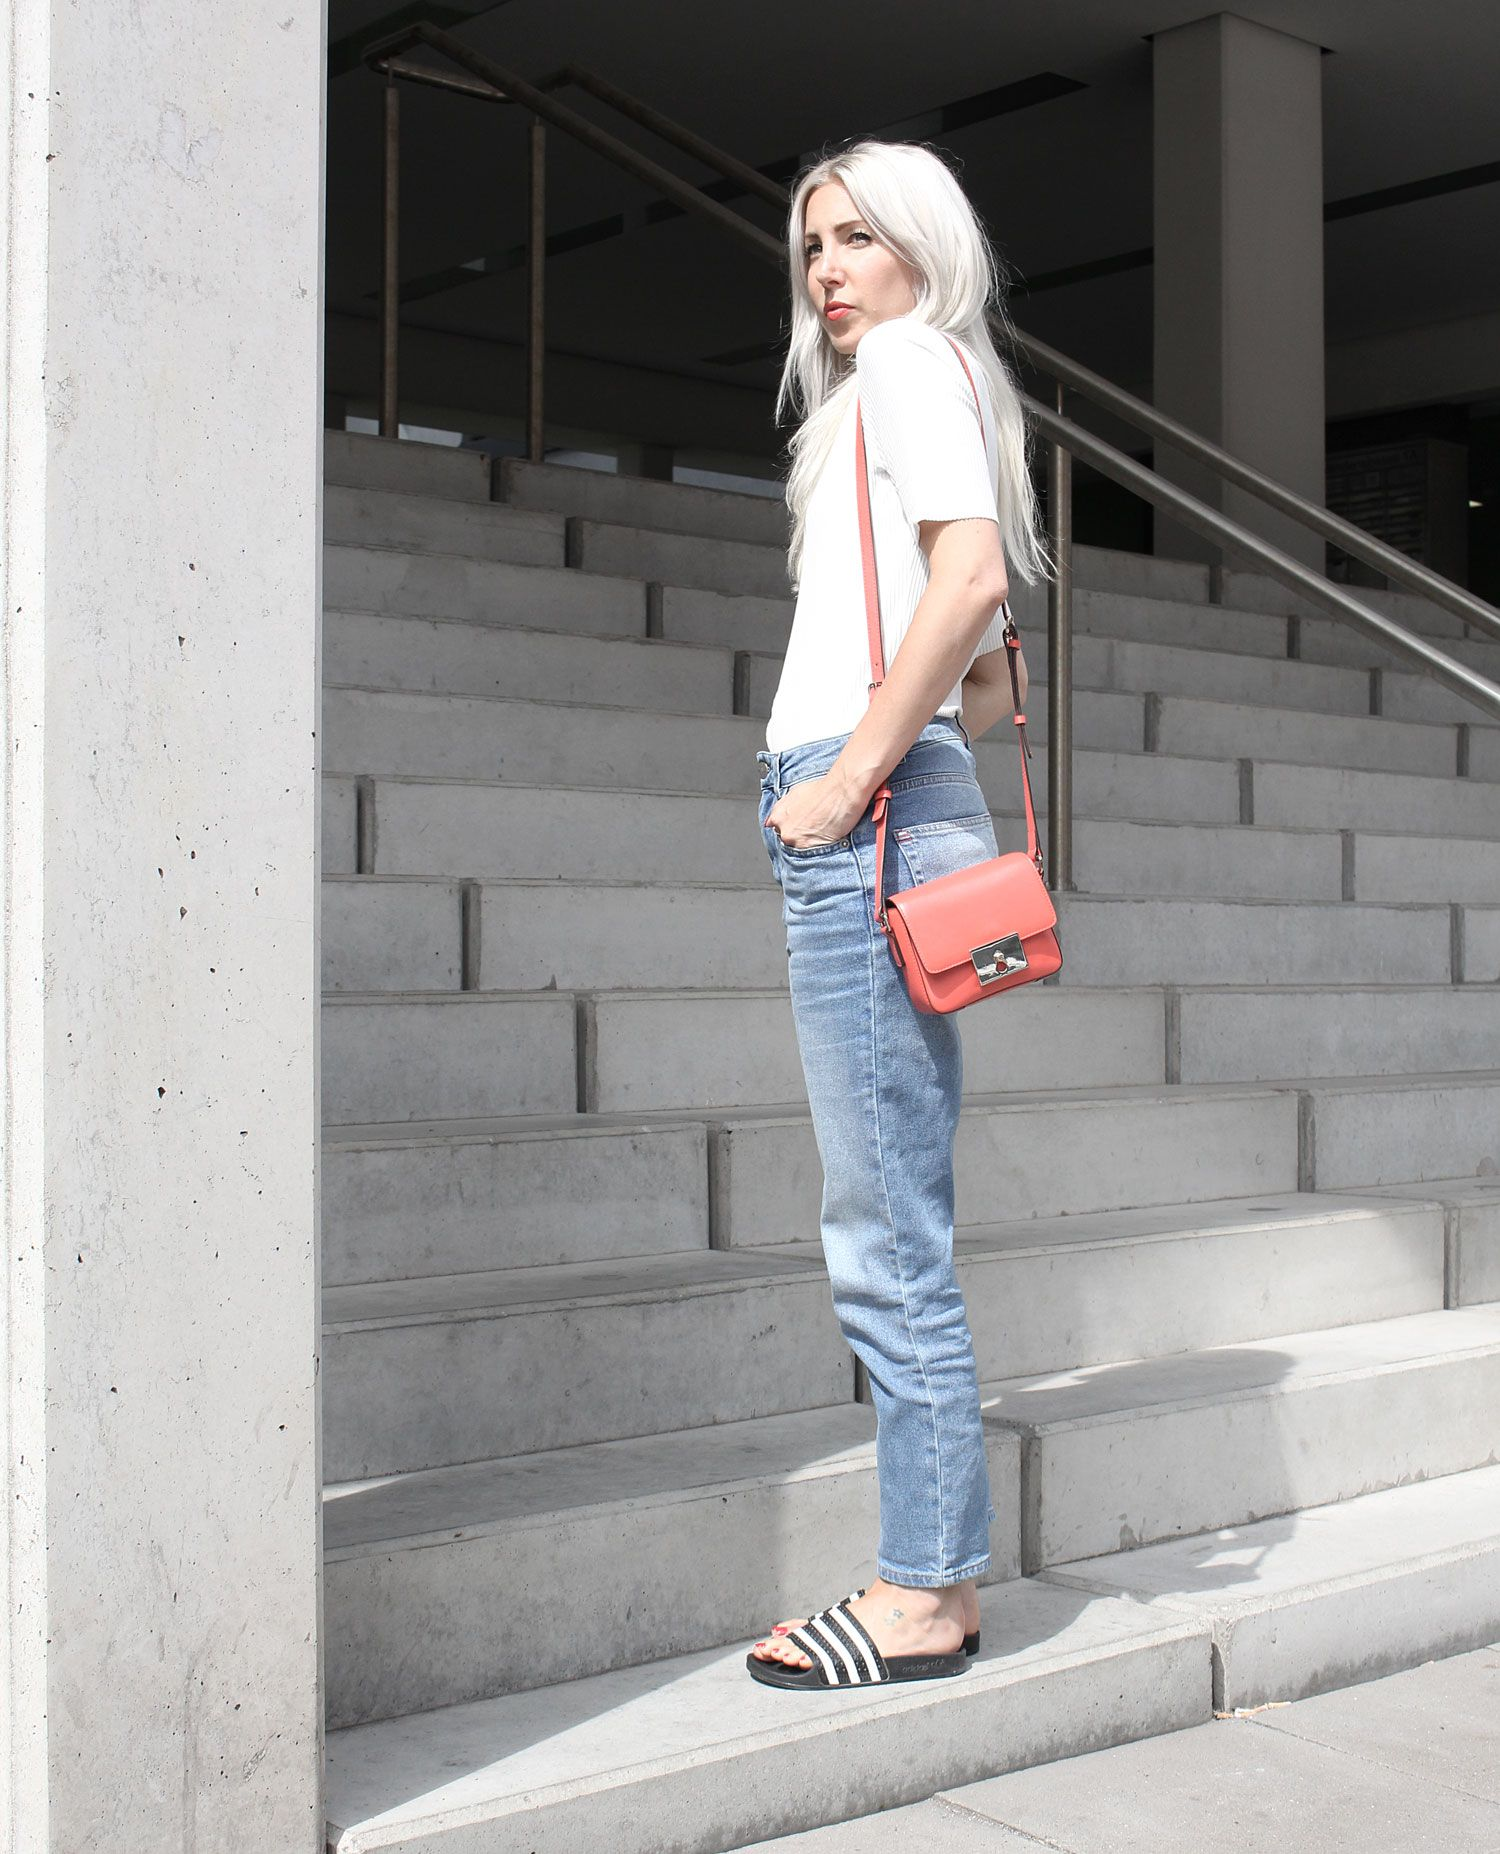 Girlfriend Jeans, BDG, Weekday, casual, Adiletten, Tila March, white T-Shirt, Look, lotd, ootd, Outfit, Style, Fashion, Blog, stryleTZ